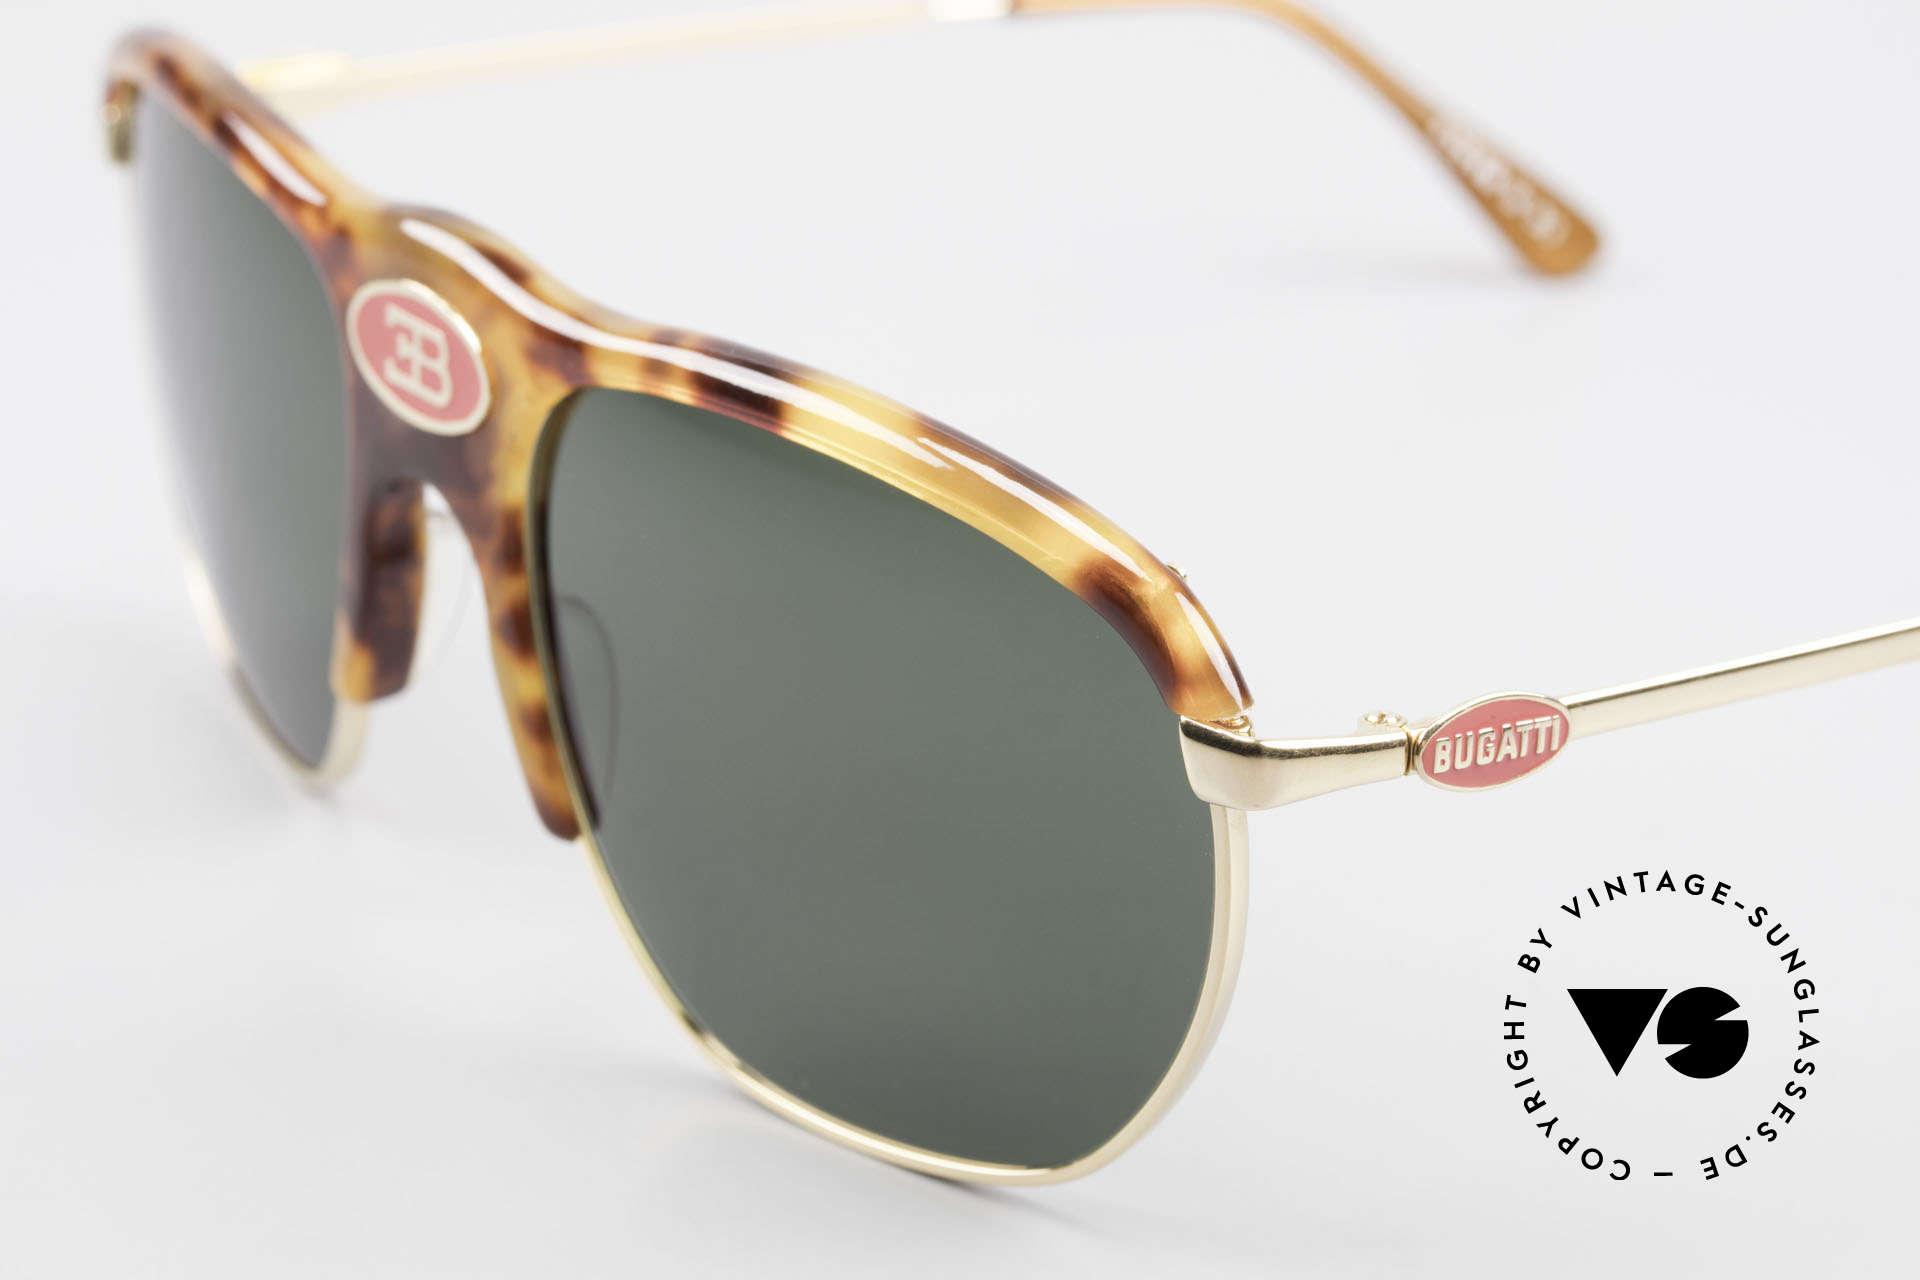 Bugatti 65218 Rare 70's Bugatti Sunglasses, much sought-after collector's item (museum piece), Made for Men